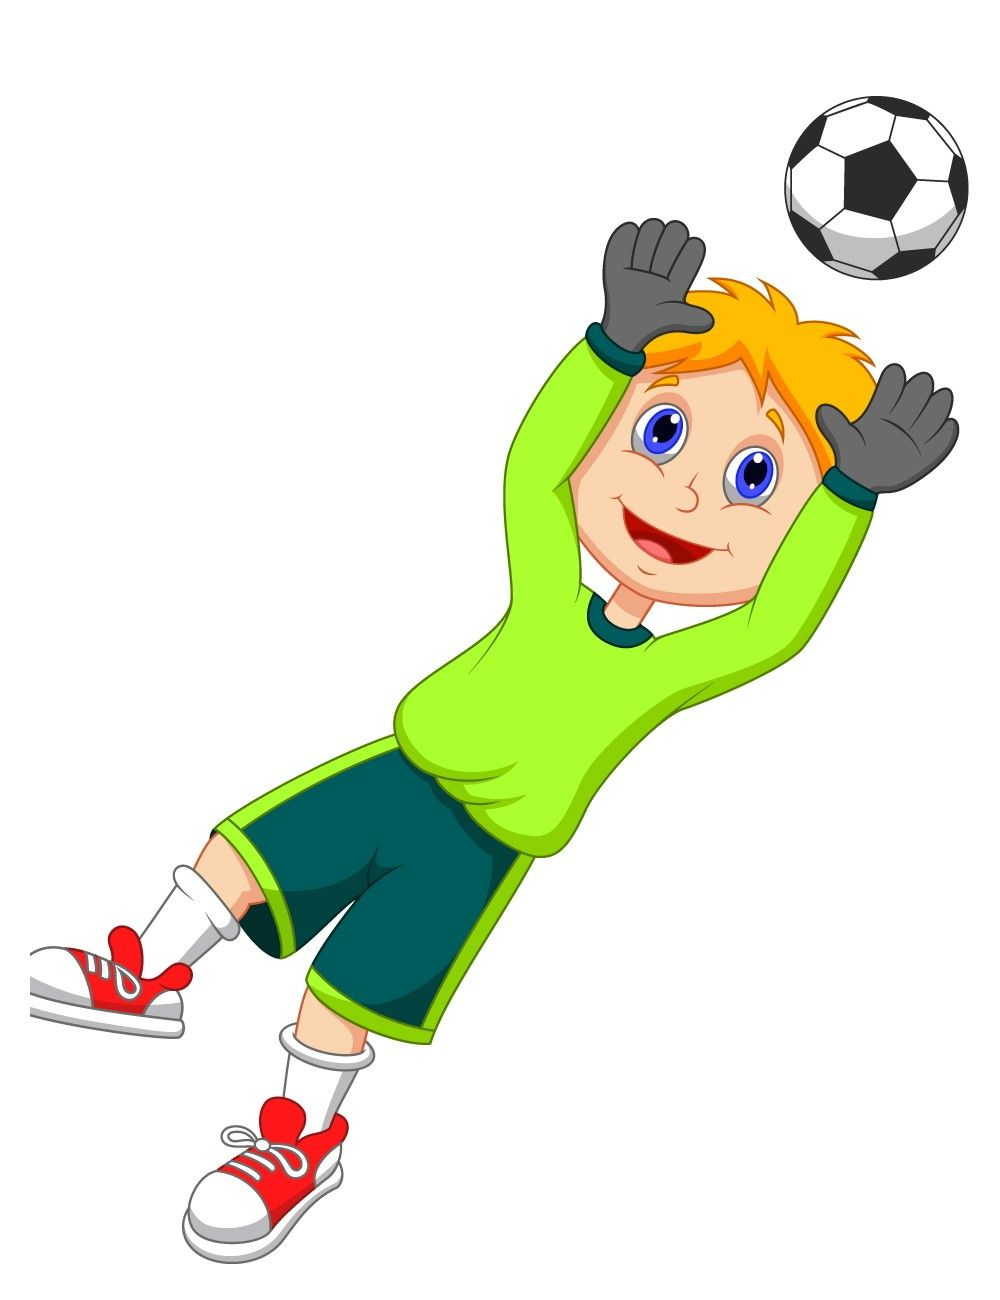 Kid Football Player Cartoon Imagem F Free Cartoon Images Free Cartoons Football Kids